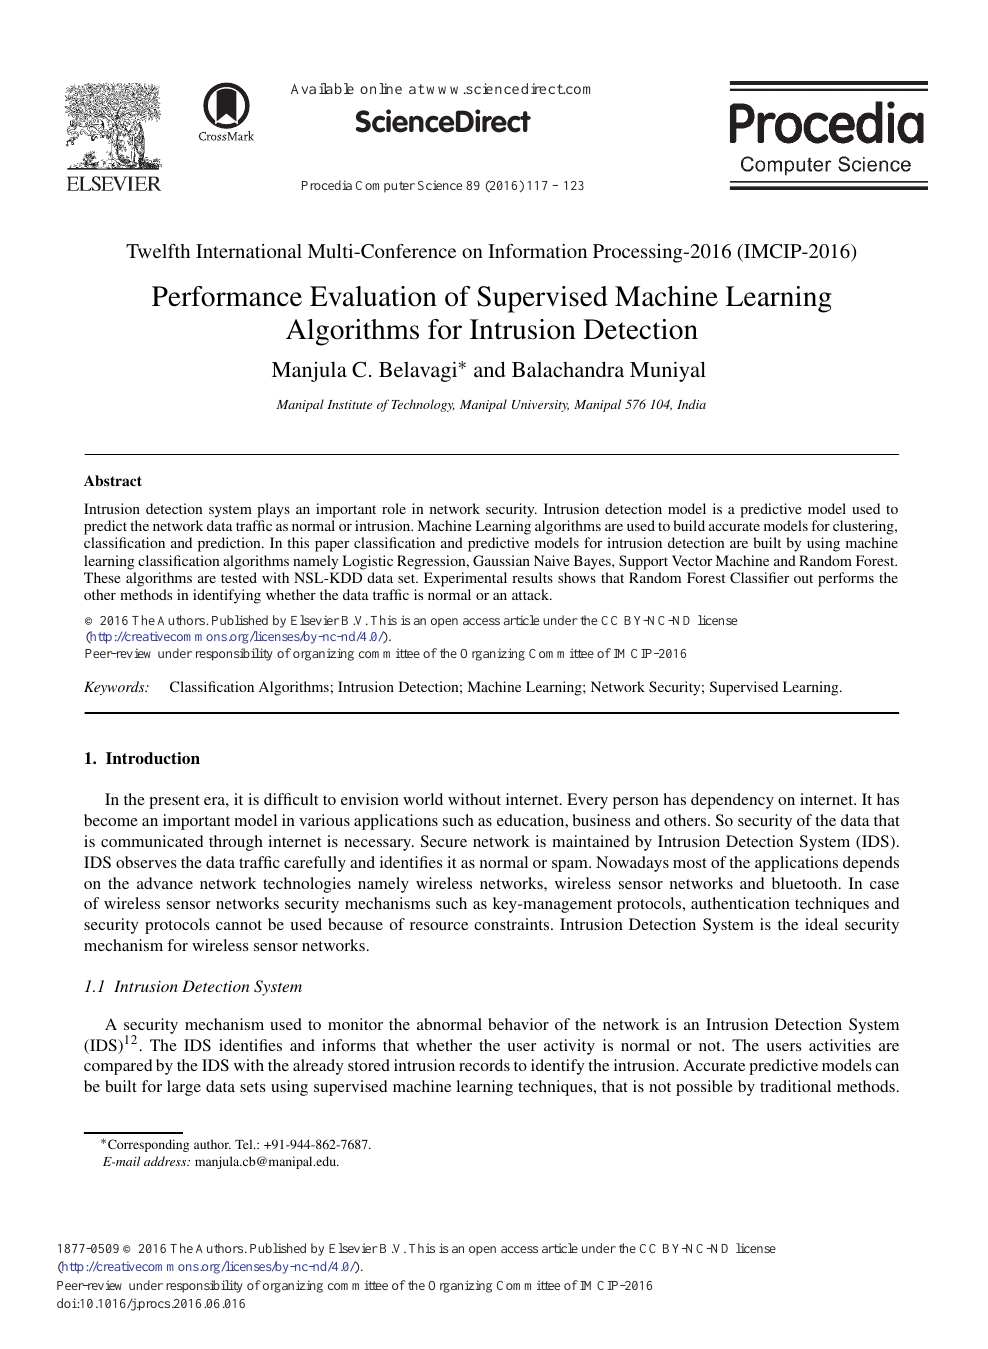 Performance Evaluation of Supervised Machine Learning